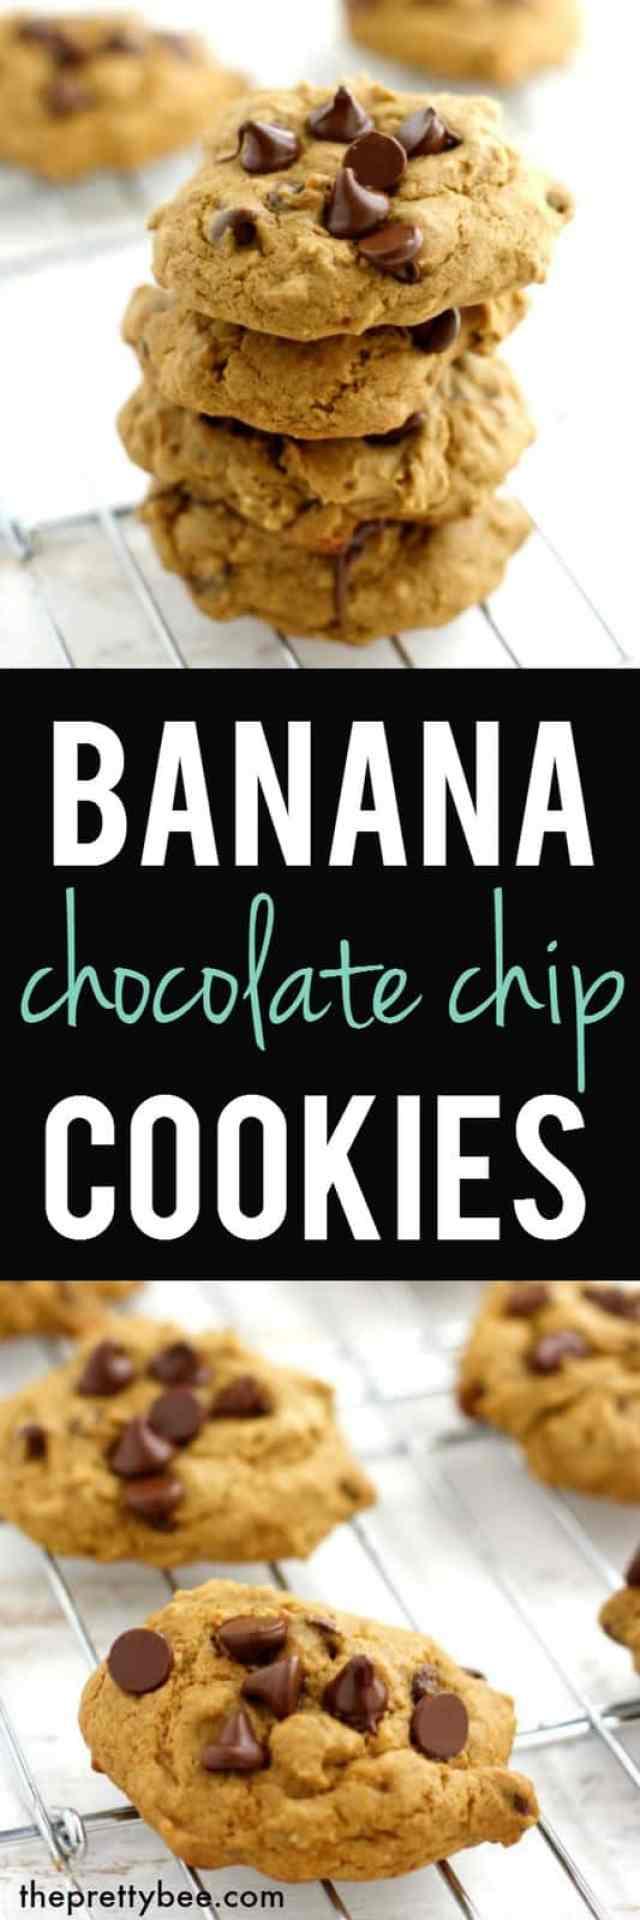 Chocolate Chip Banana Cookies (GF + Vegan). - The Pretty Bee